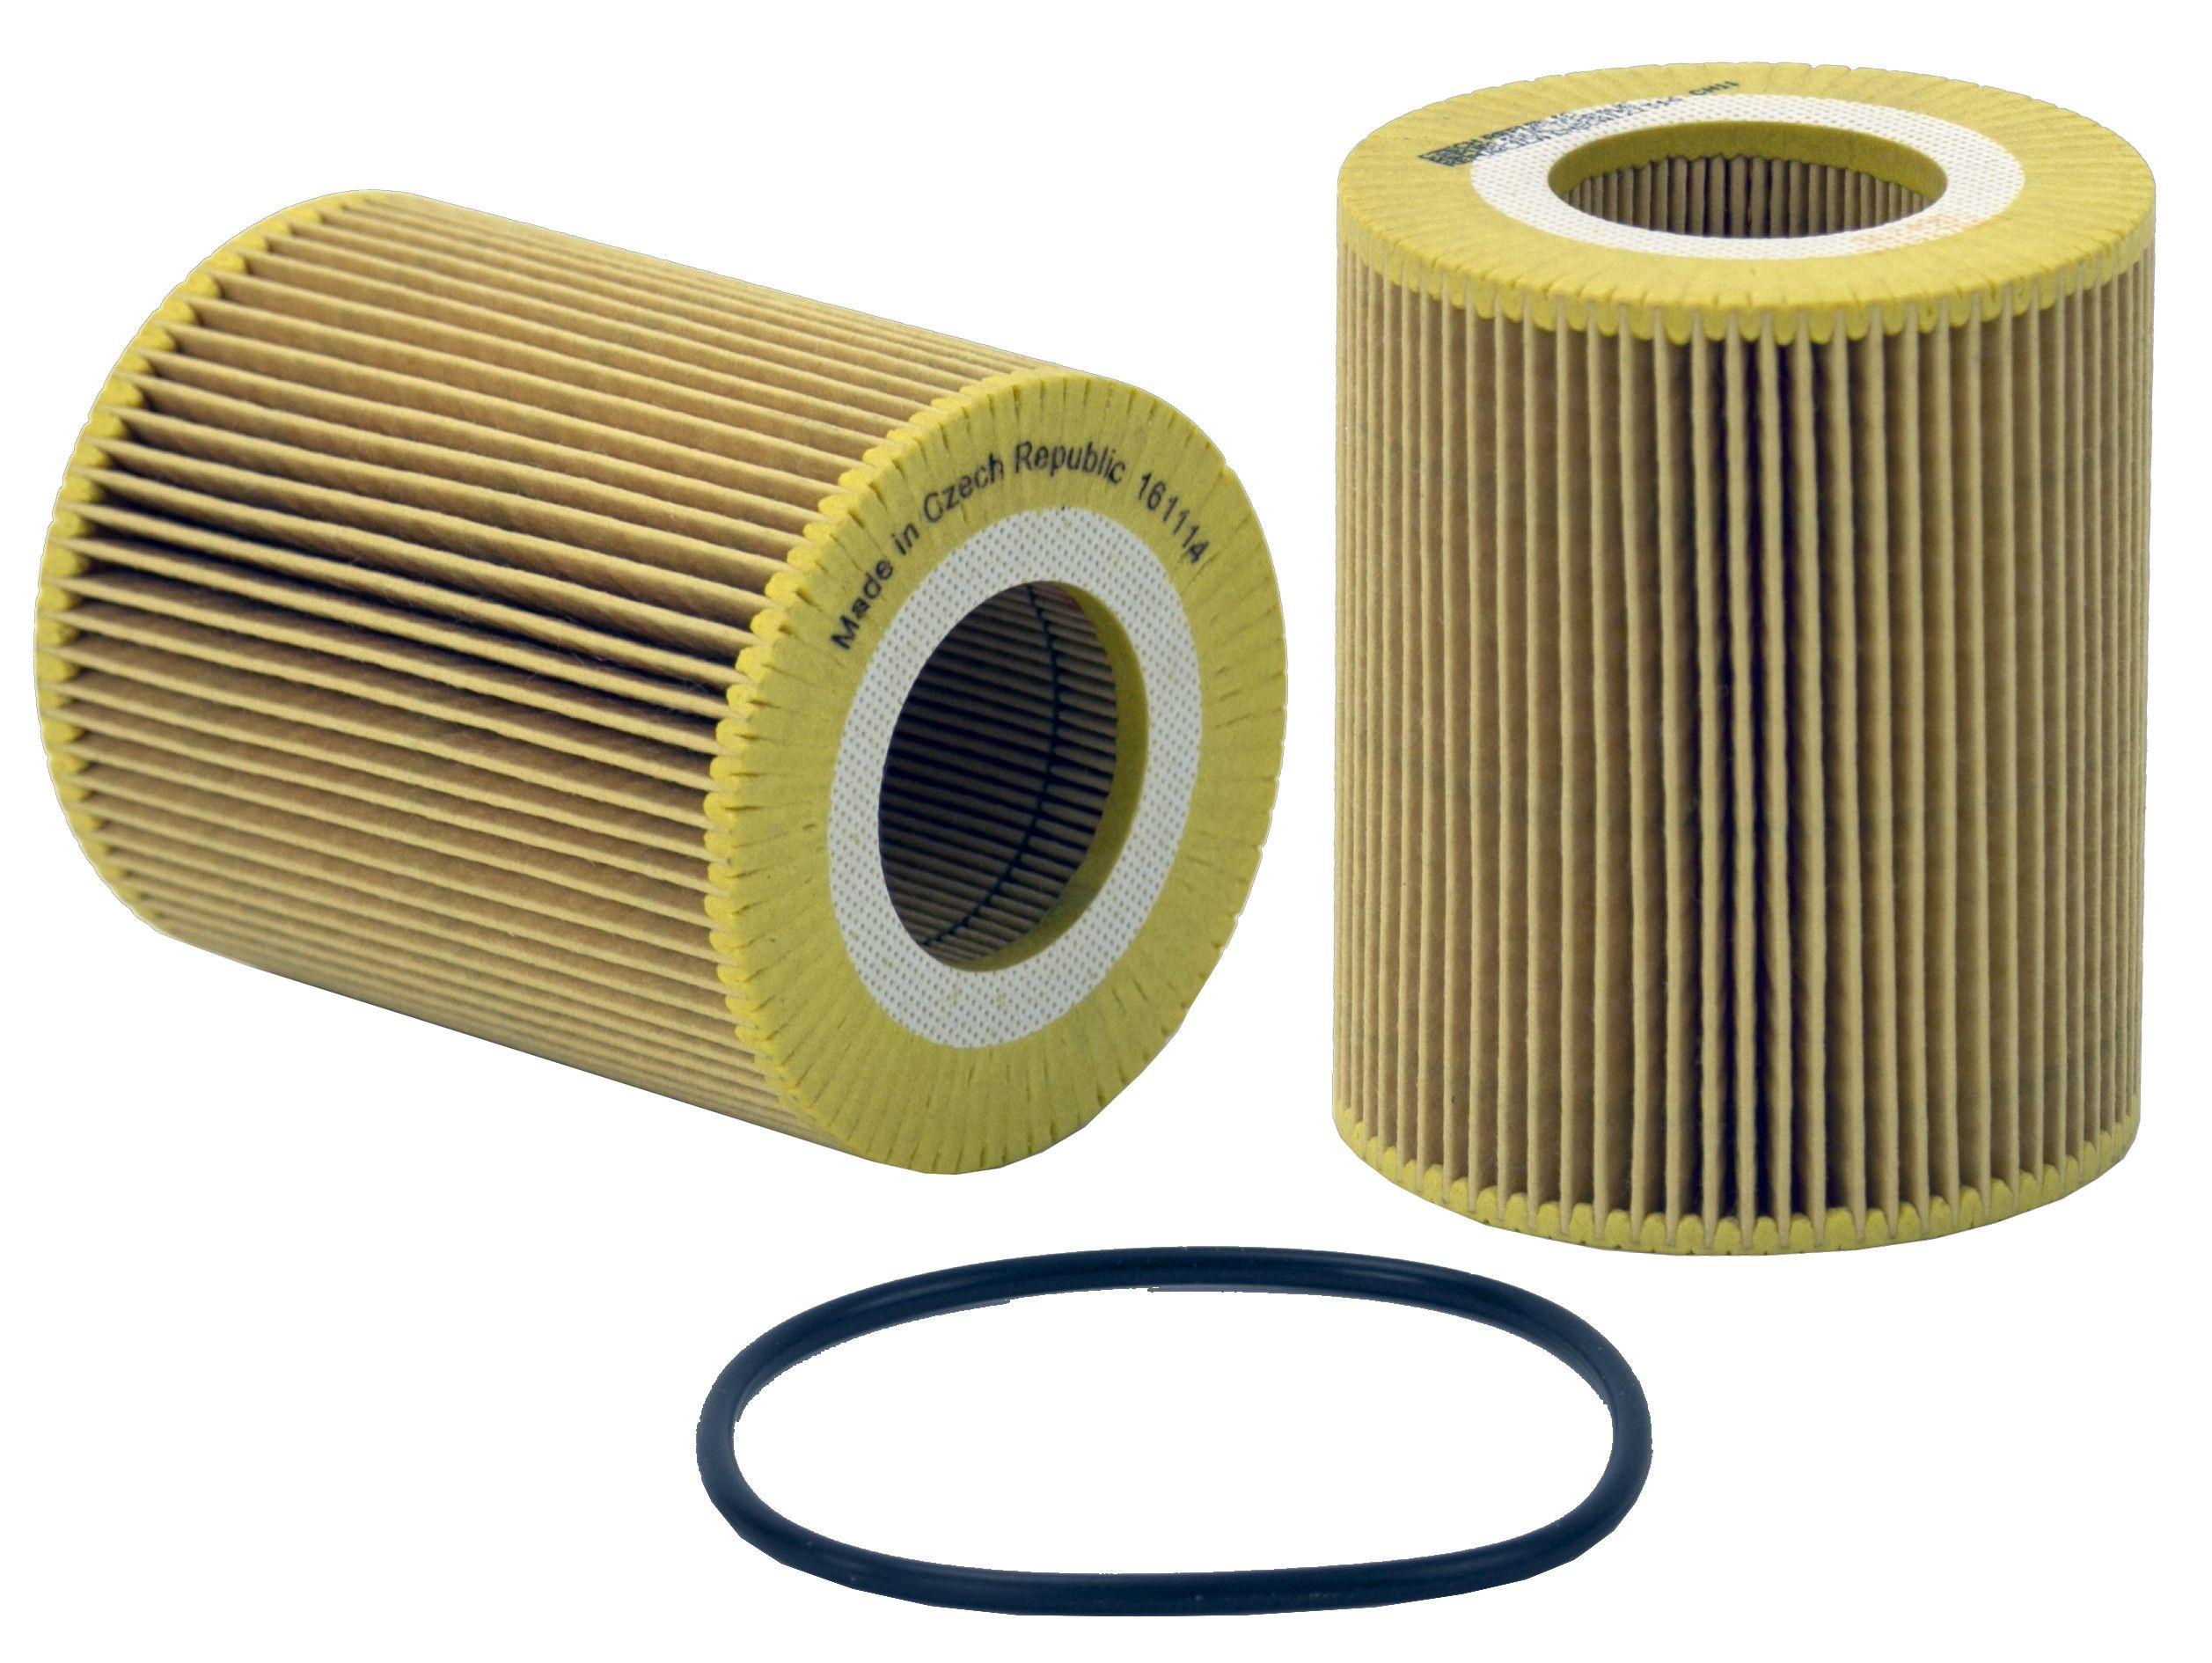 Ford F  Engine Oil Filter Main  L Wix Wl Manufacturer Oe Recommended Oil Change Intervals